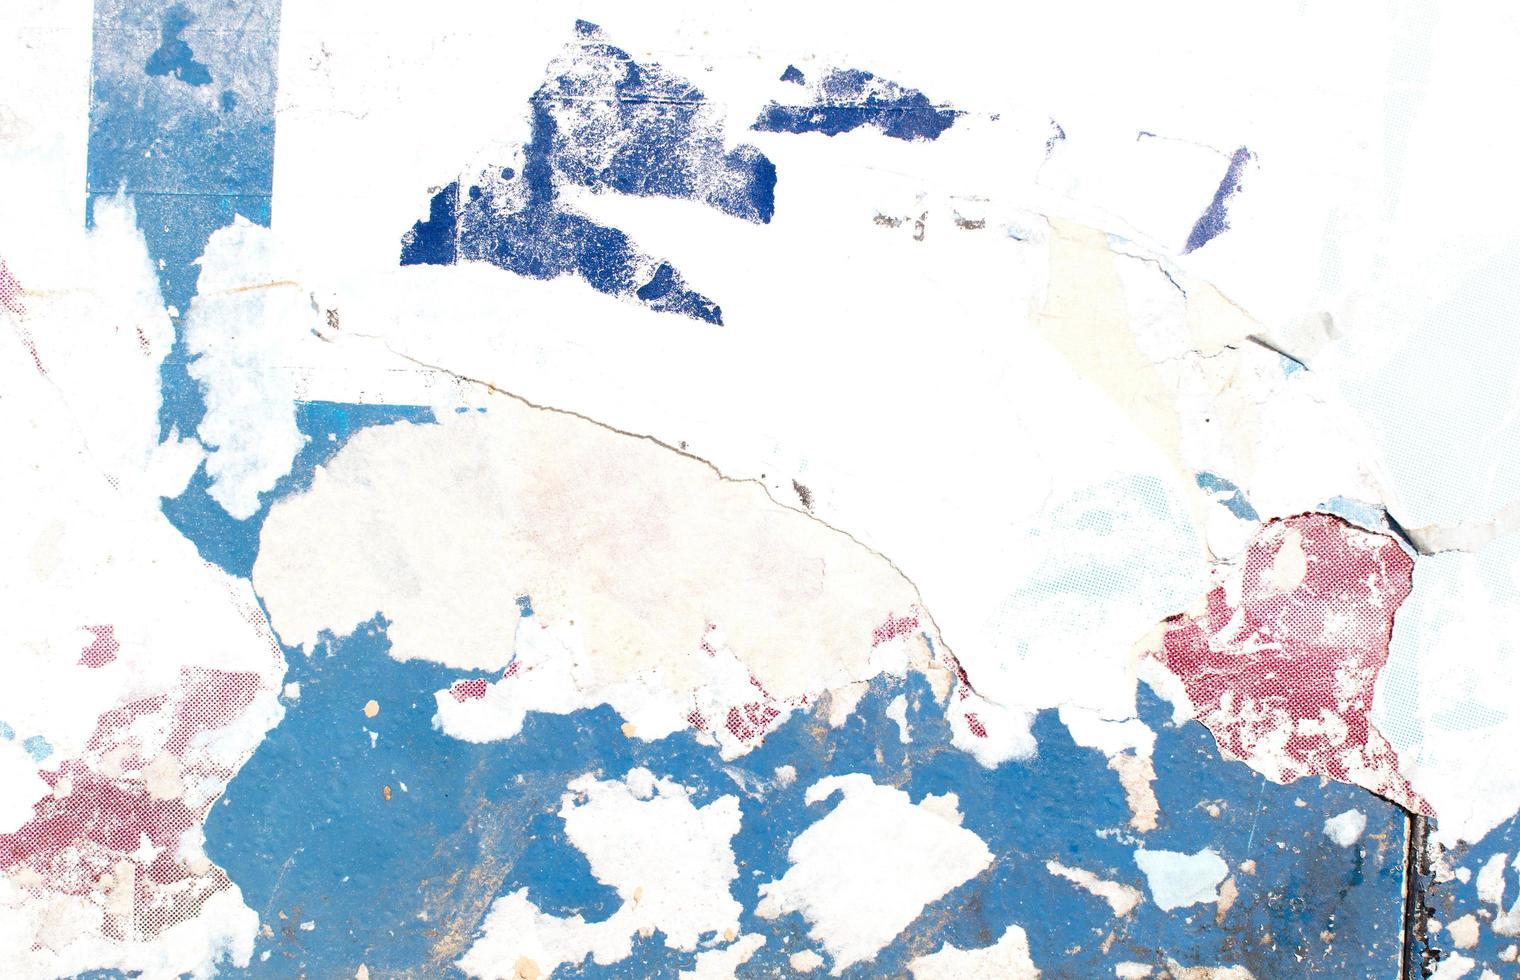 abgebrochene blaue und rote Farbe foto